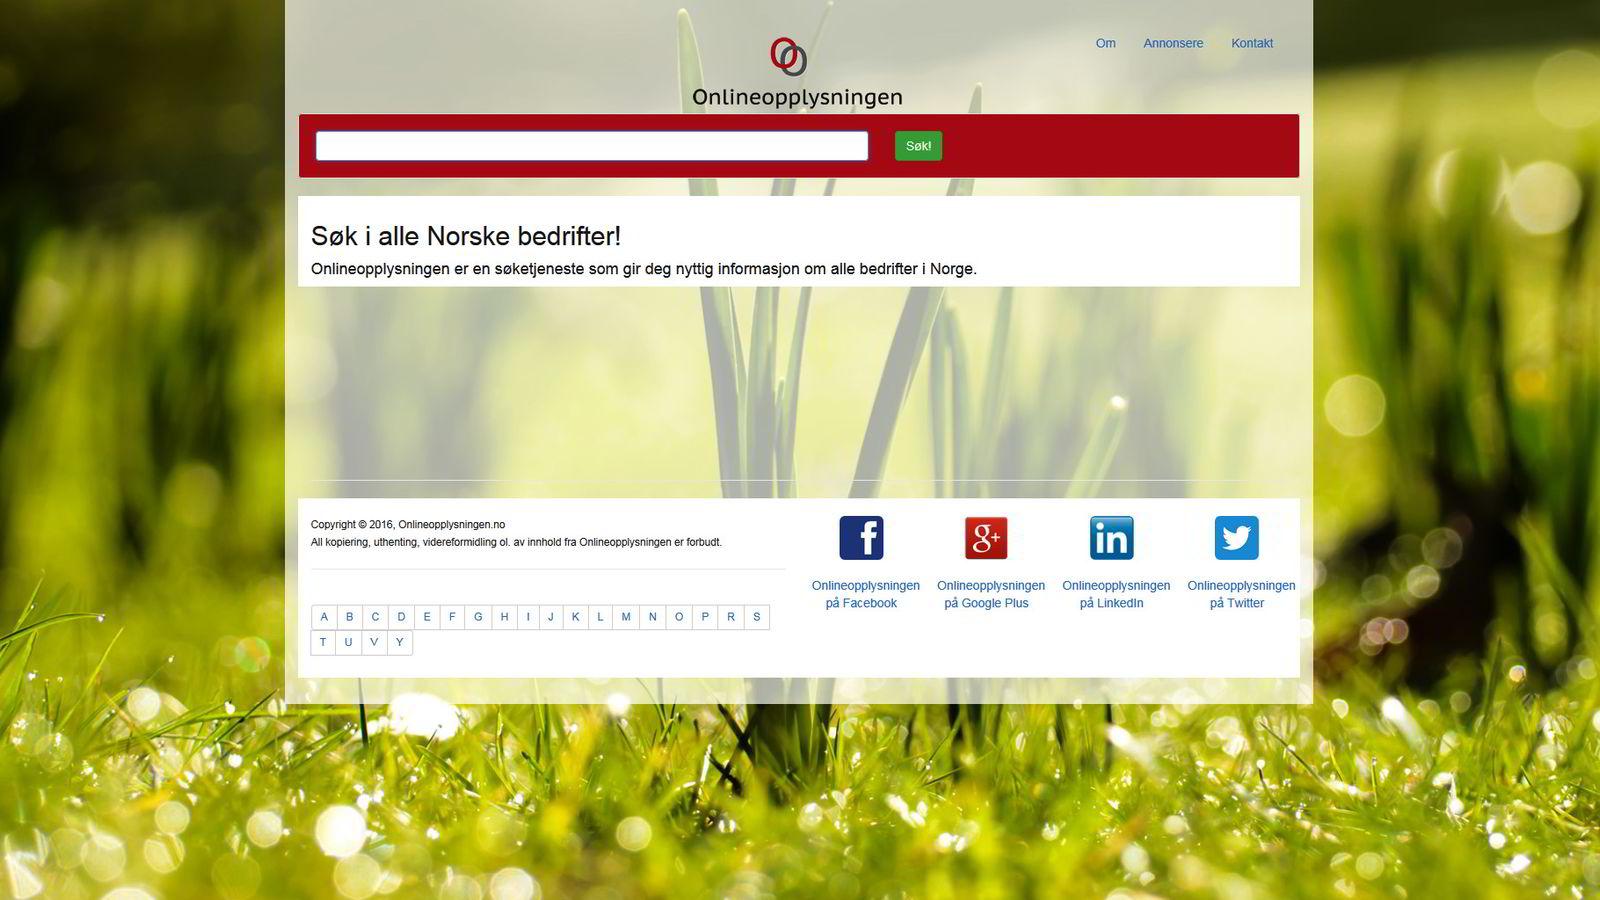 Nett-tjenesten Onlineopplysningen.